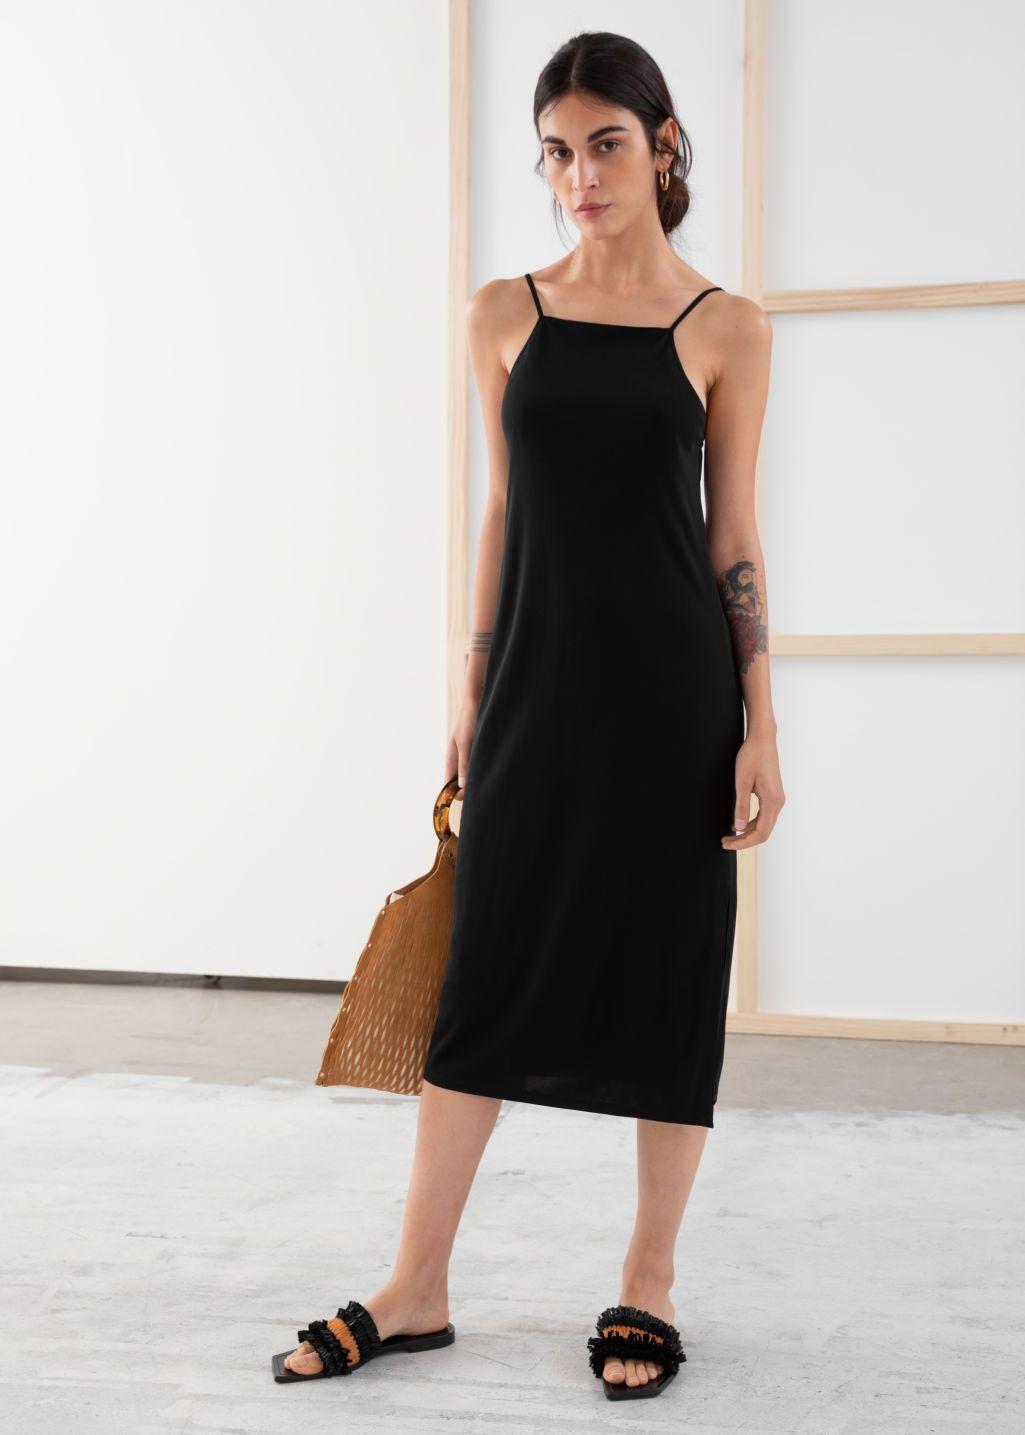 Square Neck Midi Slip Dress Slip Dress Midi Slip Dress Dresses [ 1435 x 1025 Pixel ]